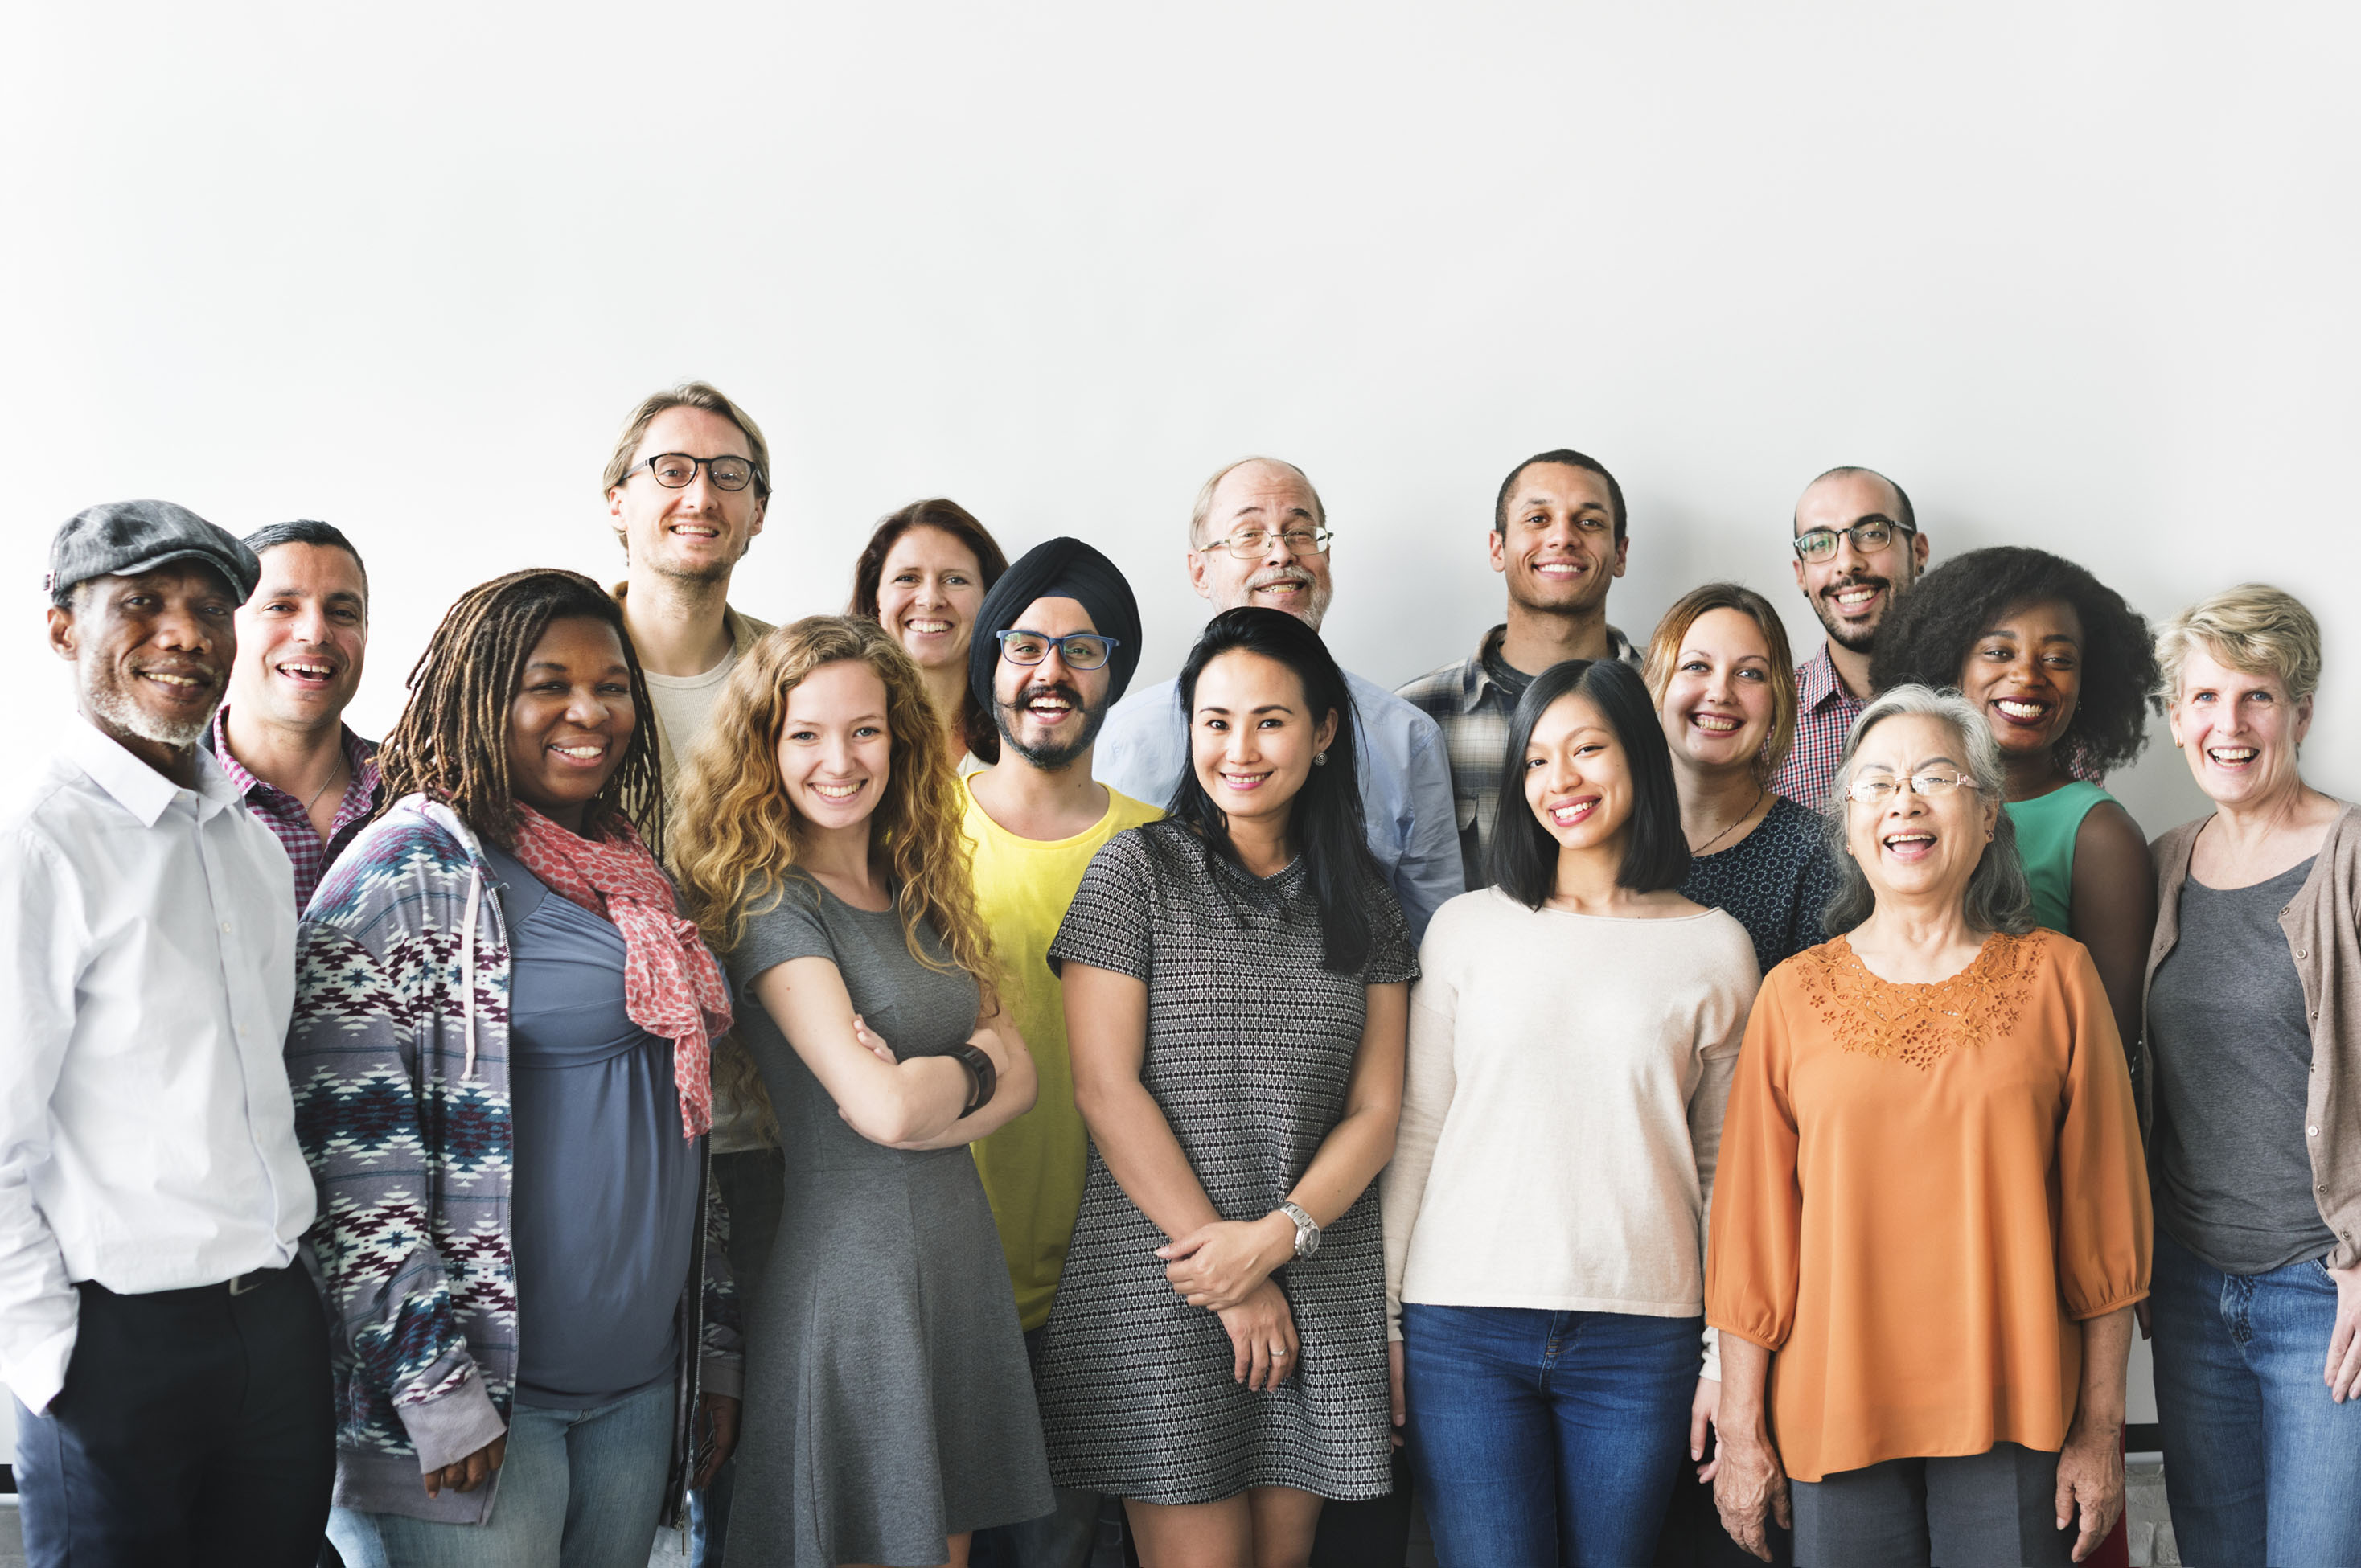 Diversity People Group Team Union Concept